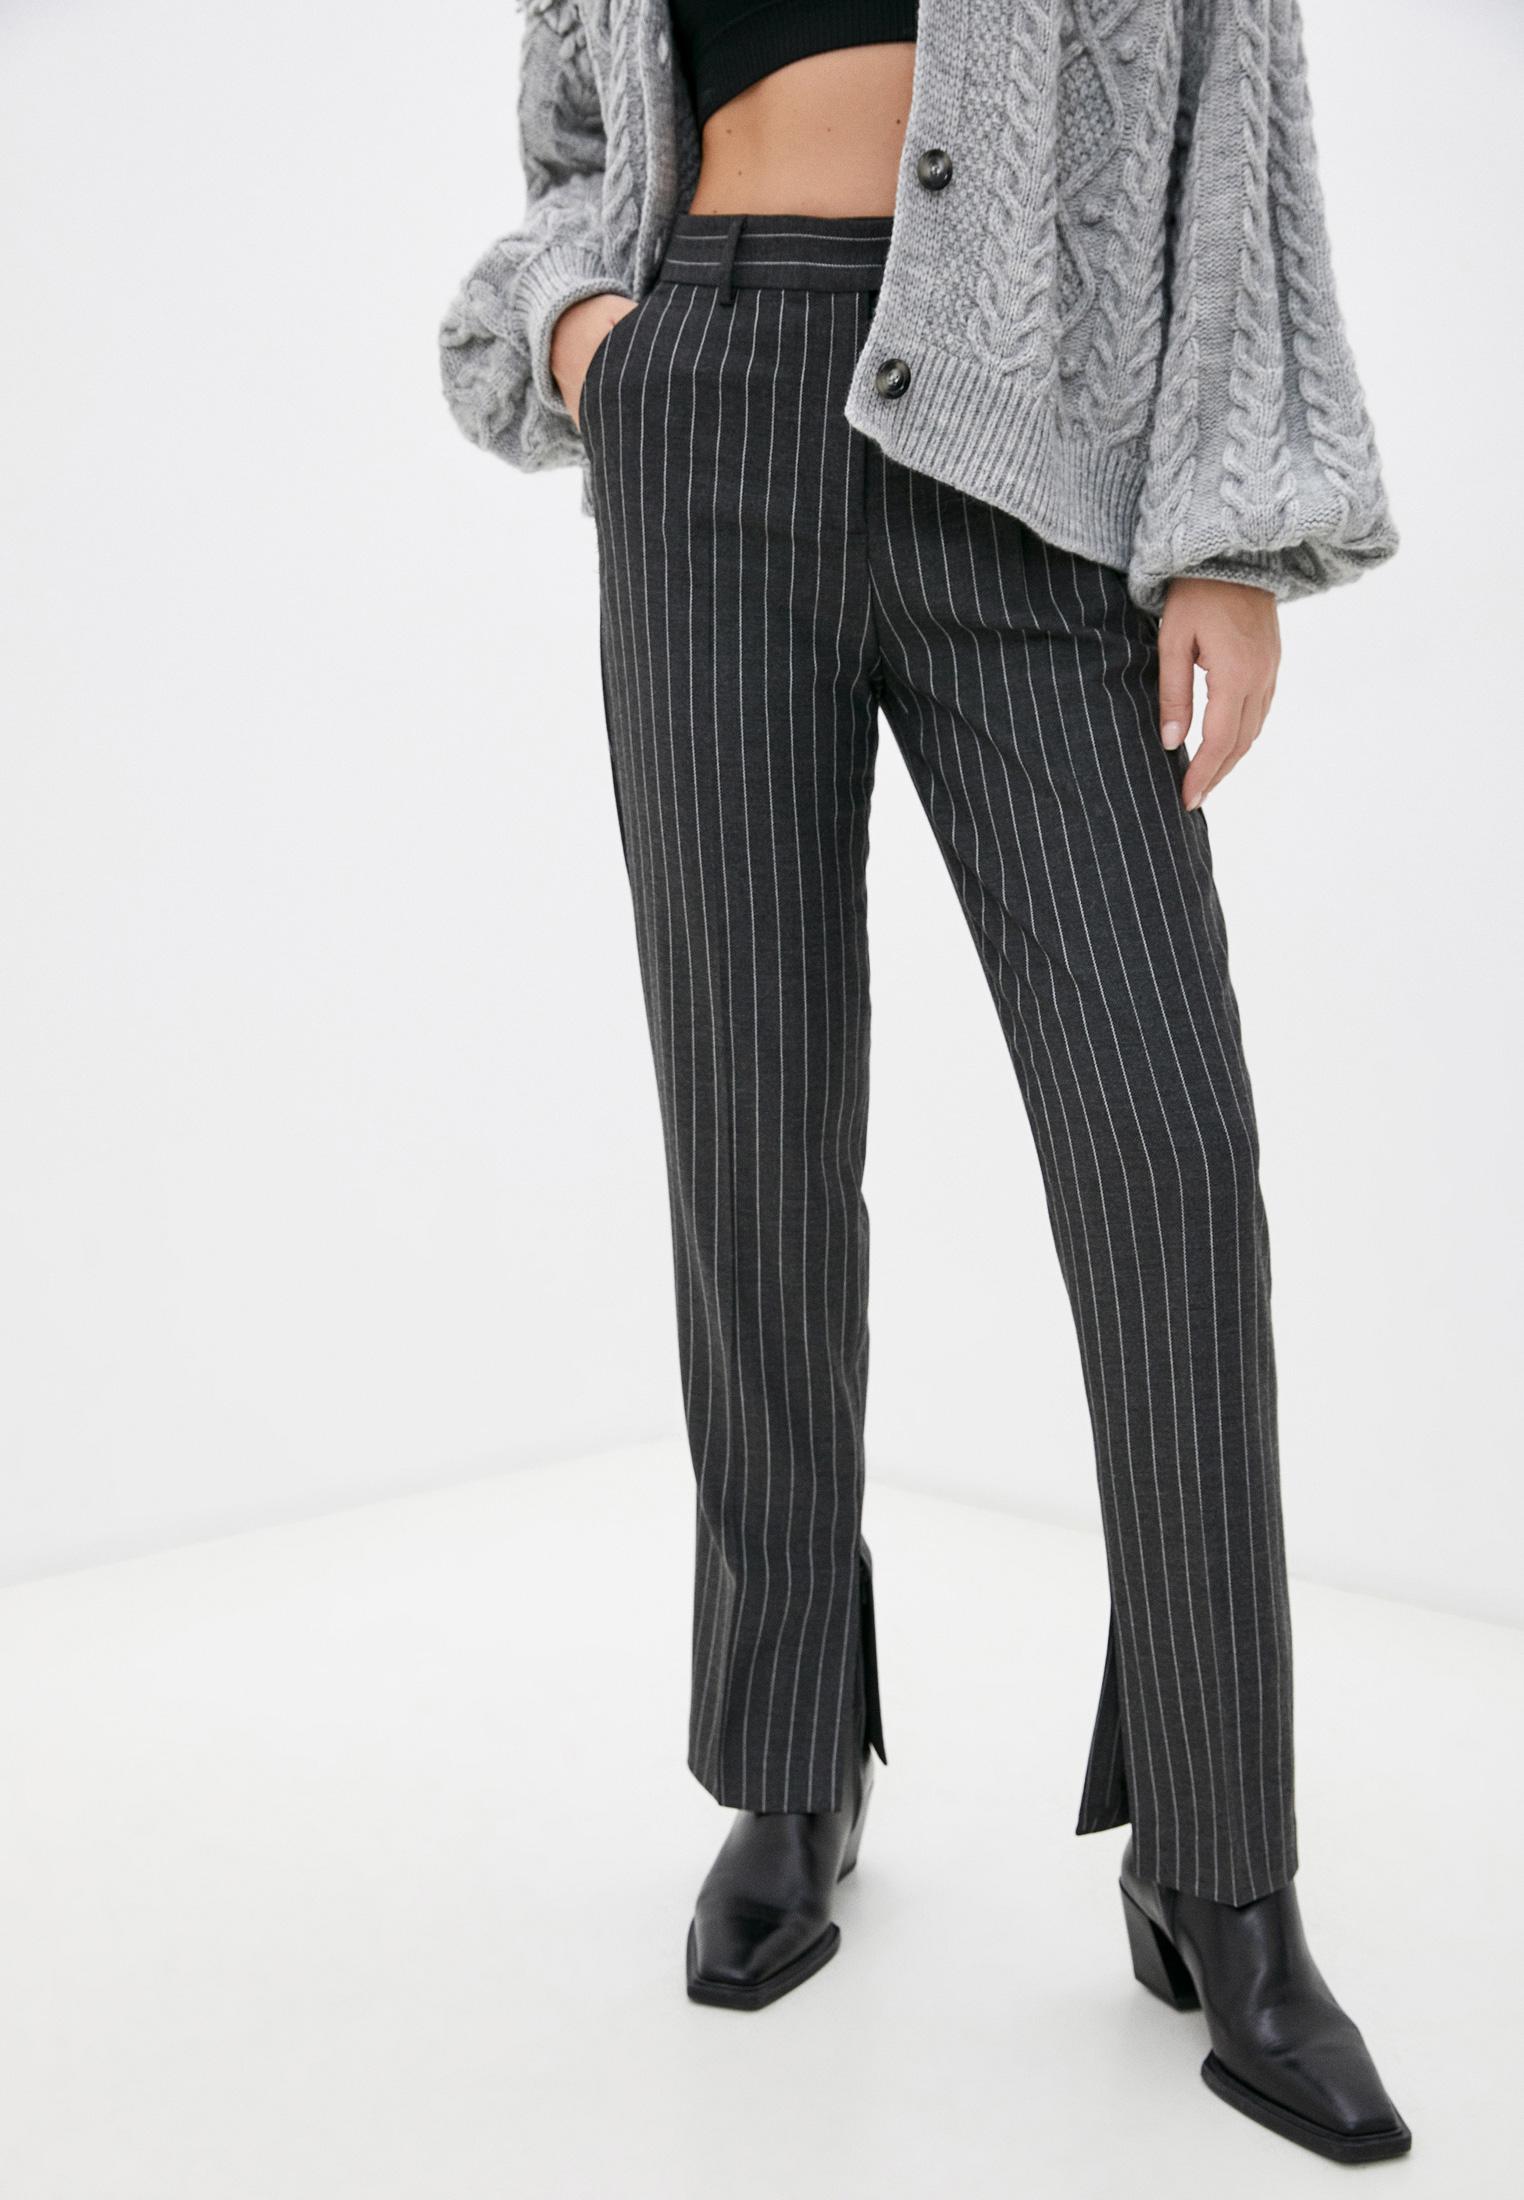 Женские классические брюки Sisley (Сислей) Брюки Sisley